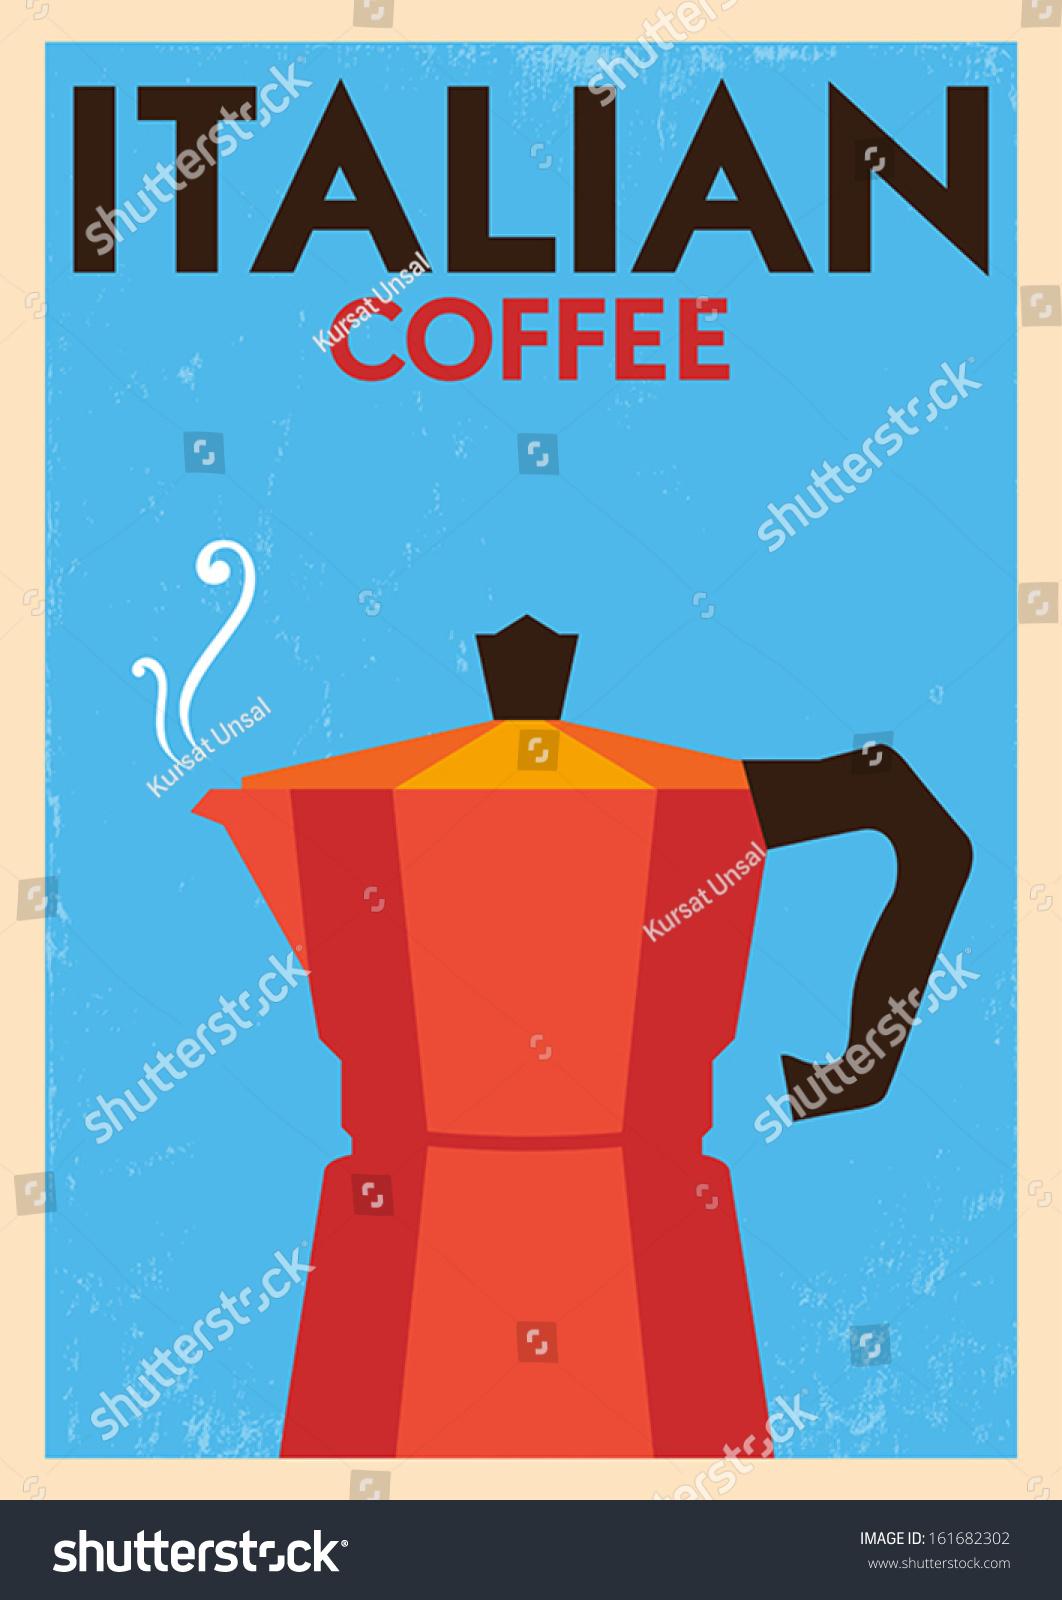 Italian Coffee Maker Vector : Italian Coffee Poster Stock Vector Illustration 161682302 : Shutterstock